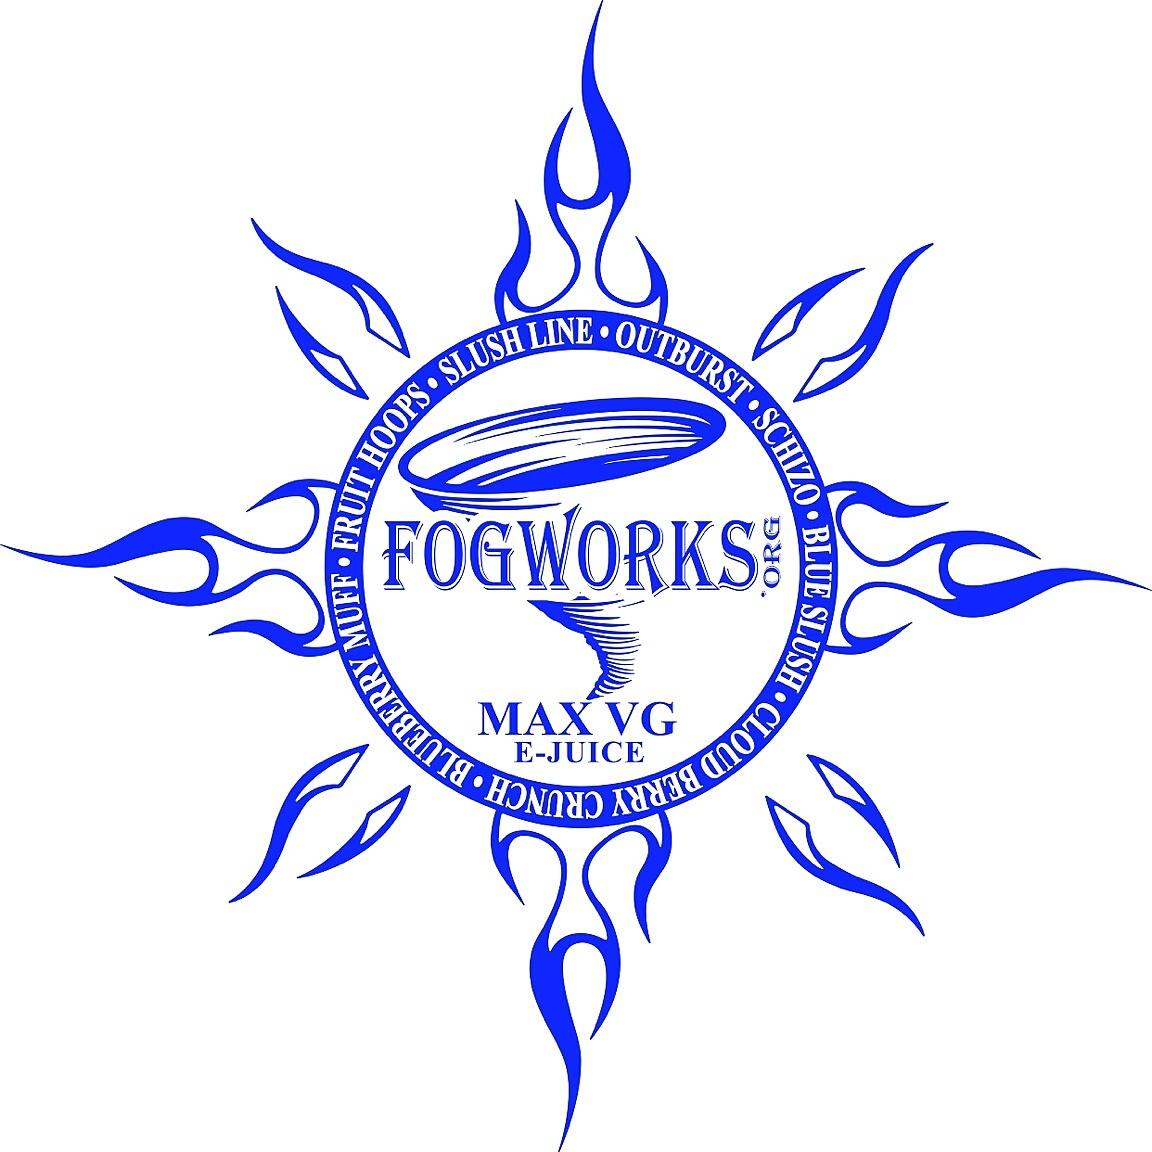 Fogworks